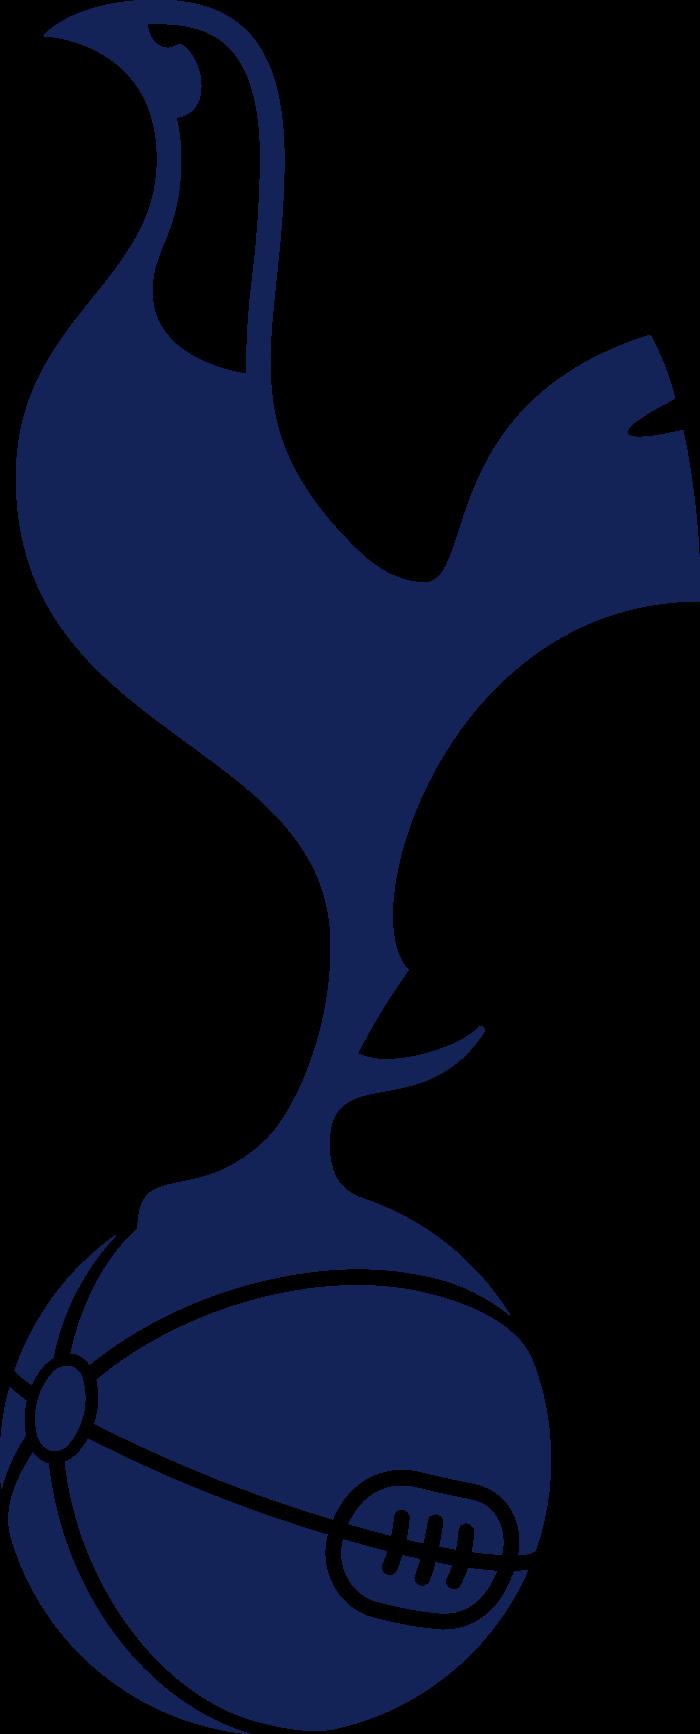 tottenham logo escudo 4 - Tottenham Hotspur FC Logo